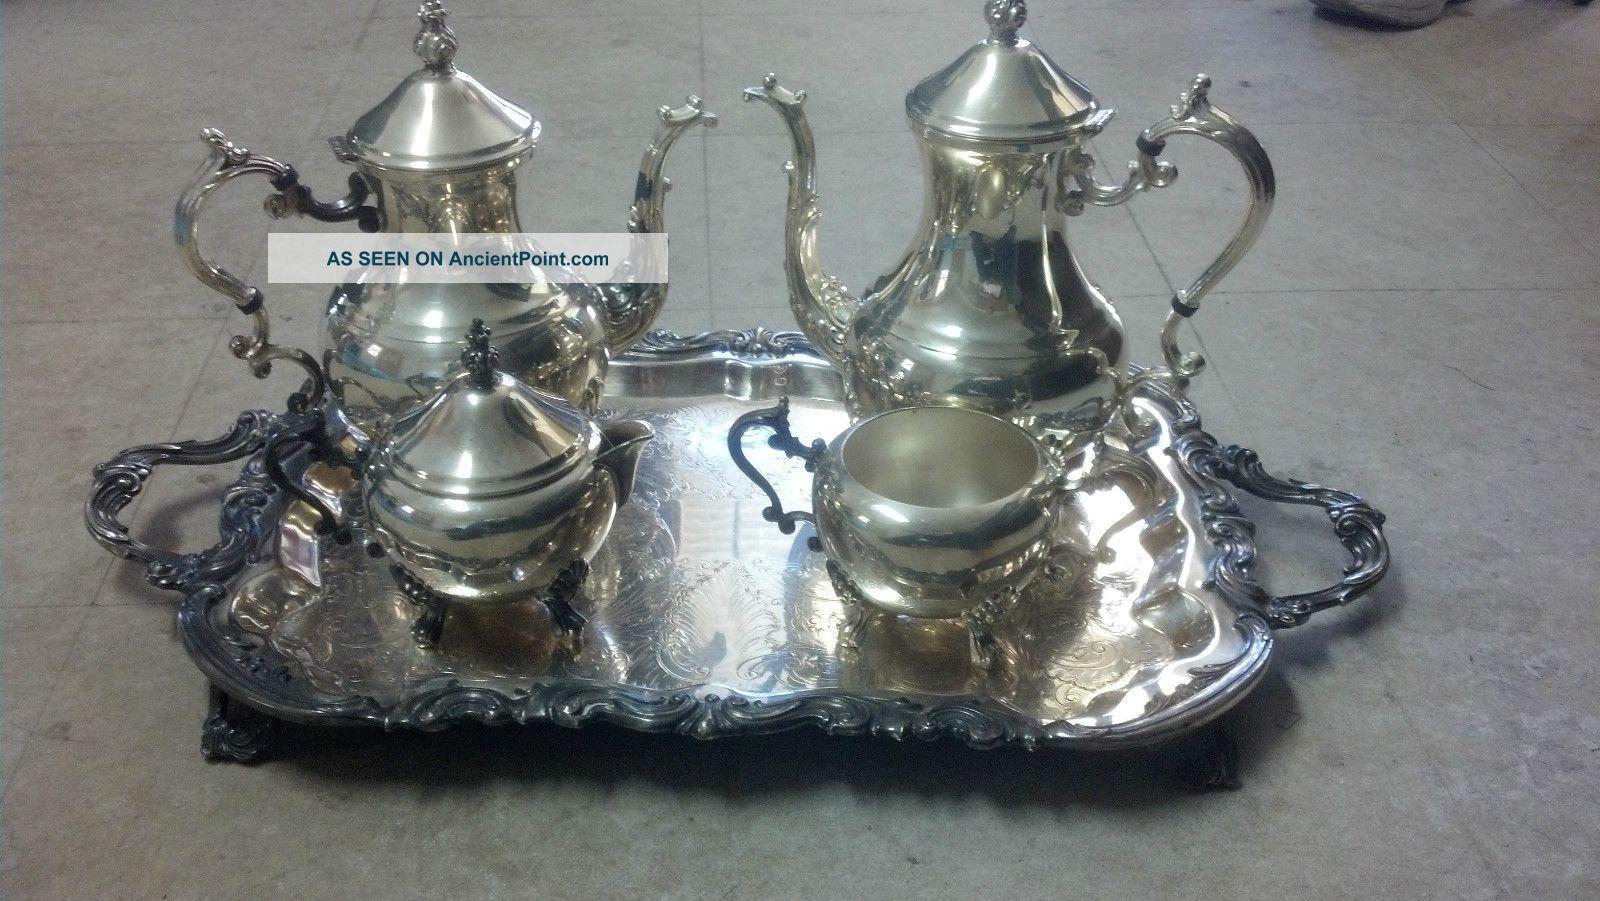 Wm.  Rogers Co Silverplate Tea Set 2377 Oneida/Wm. A. Rogers photo